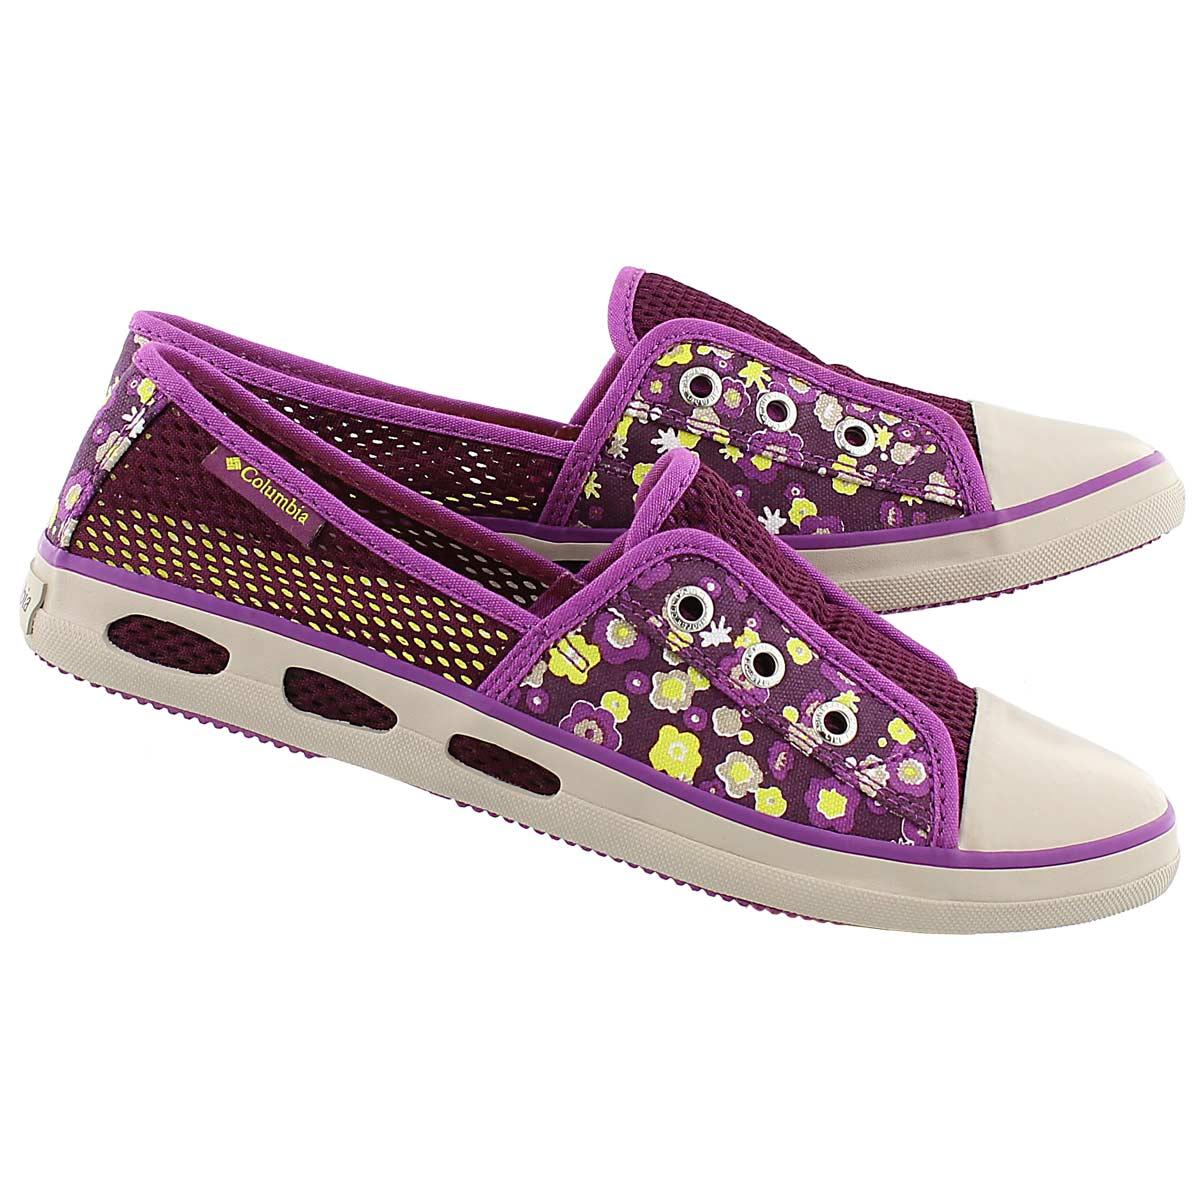 Lds Vulc N Vent Bombie purple slip on